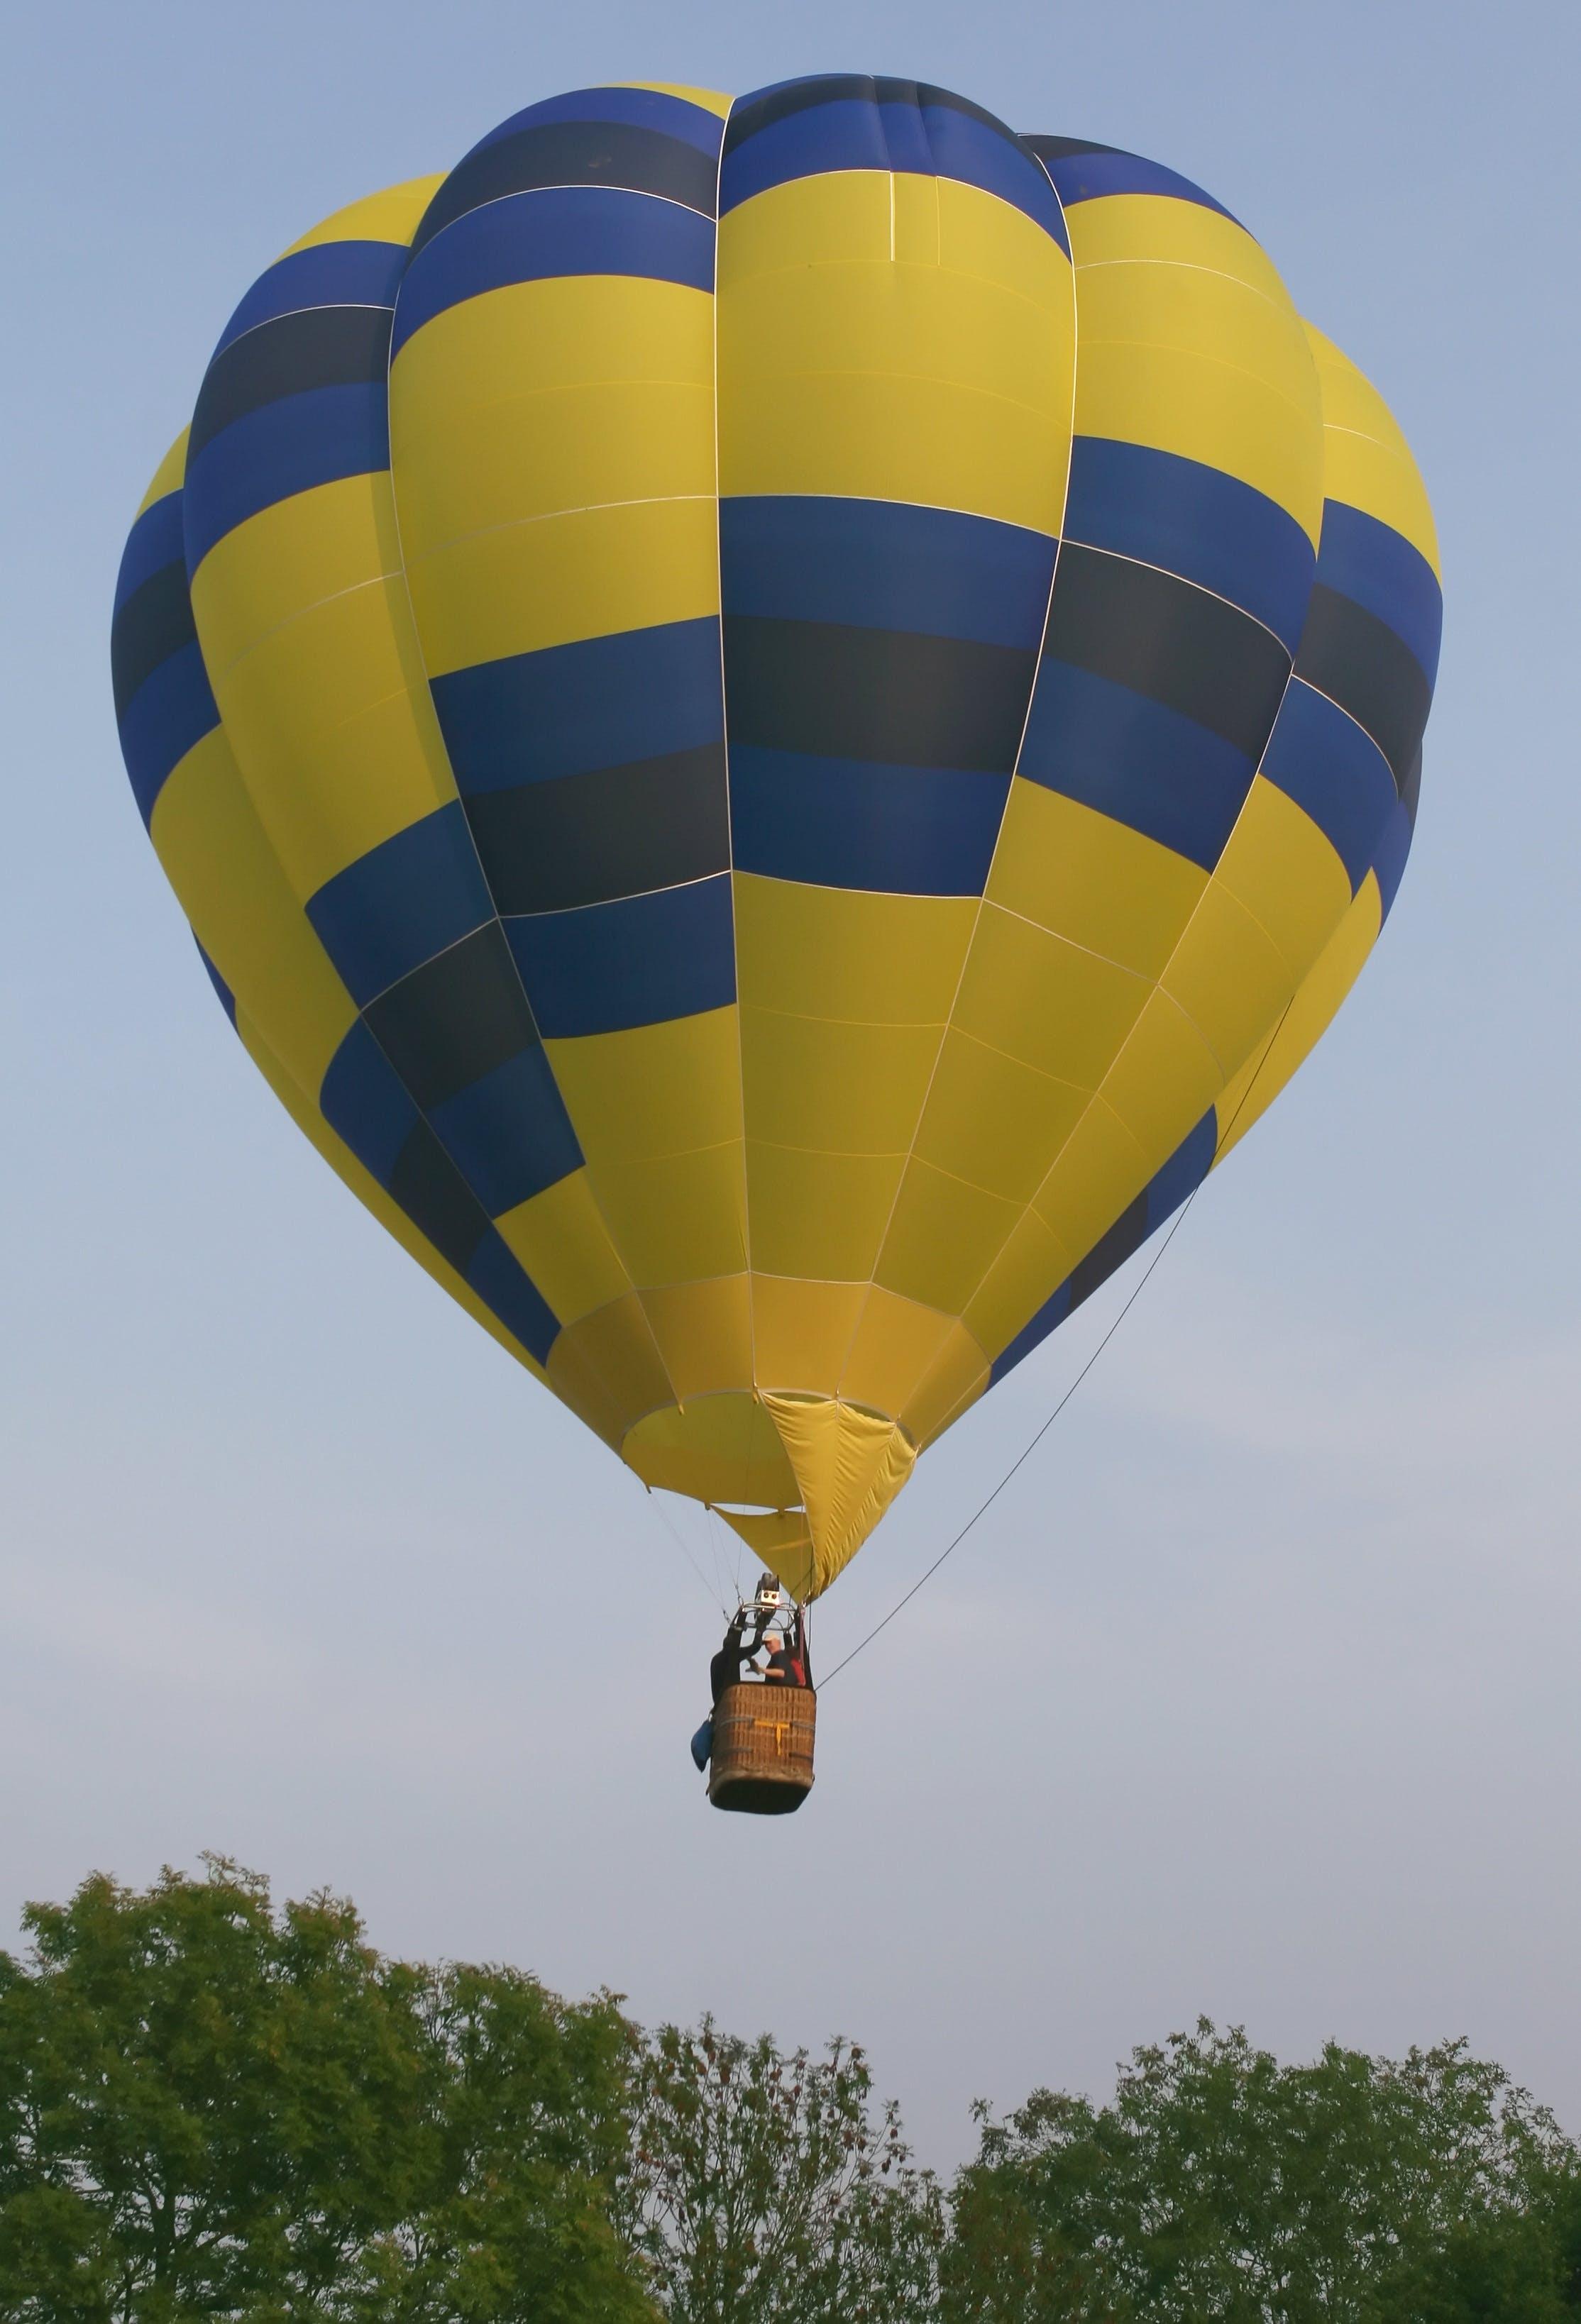 Free stock photo of flight, sky, flying, blue